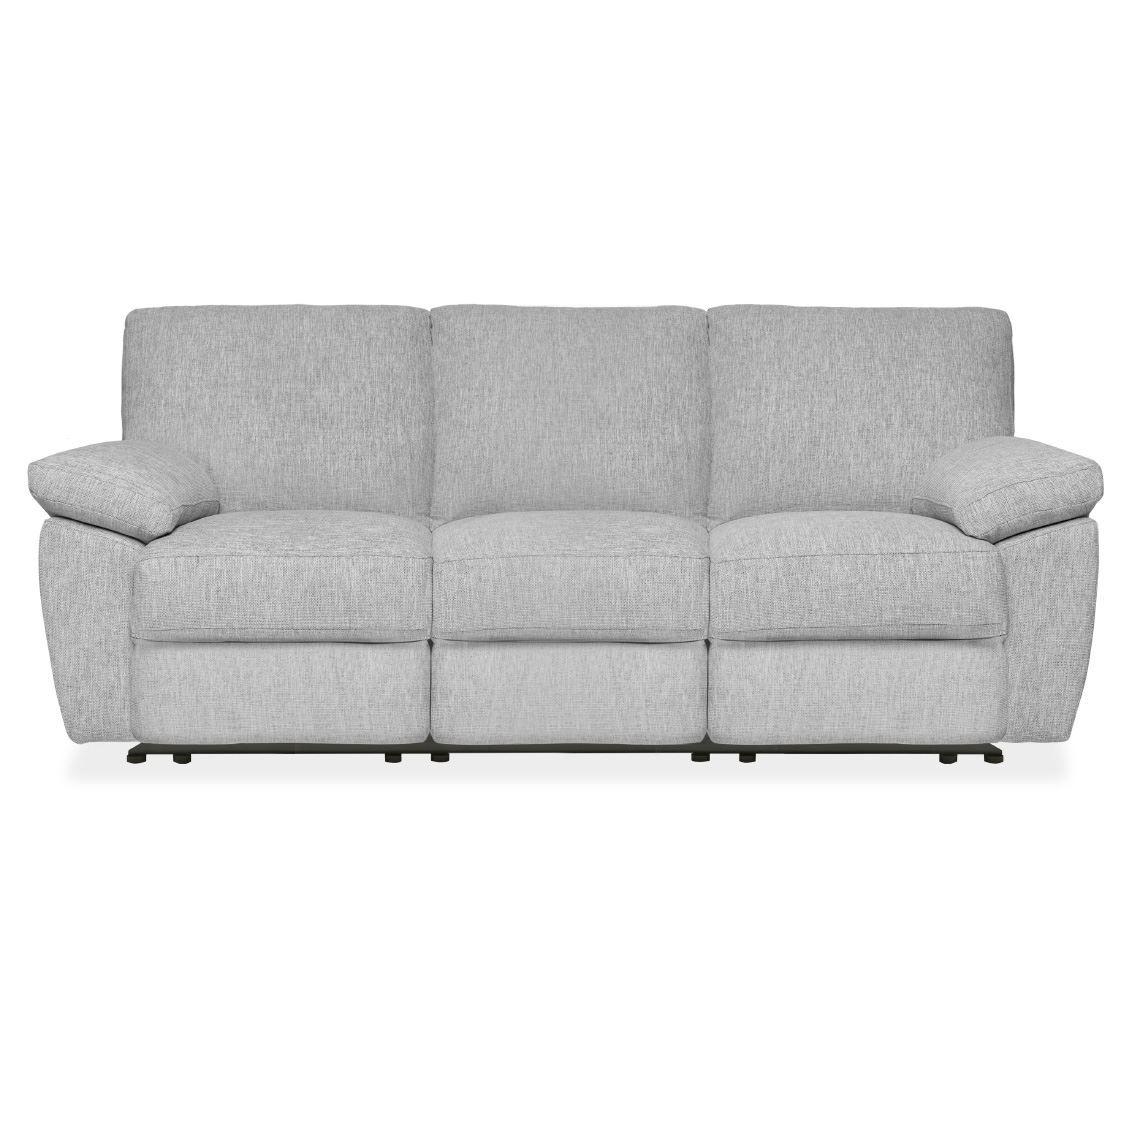 Lucas 3 Seat Fabric Manual Recliner Sofa Silverstreak With Images Reclining Sofa Manual Recliner Sofa Sofa